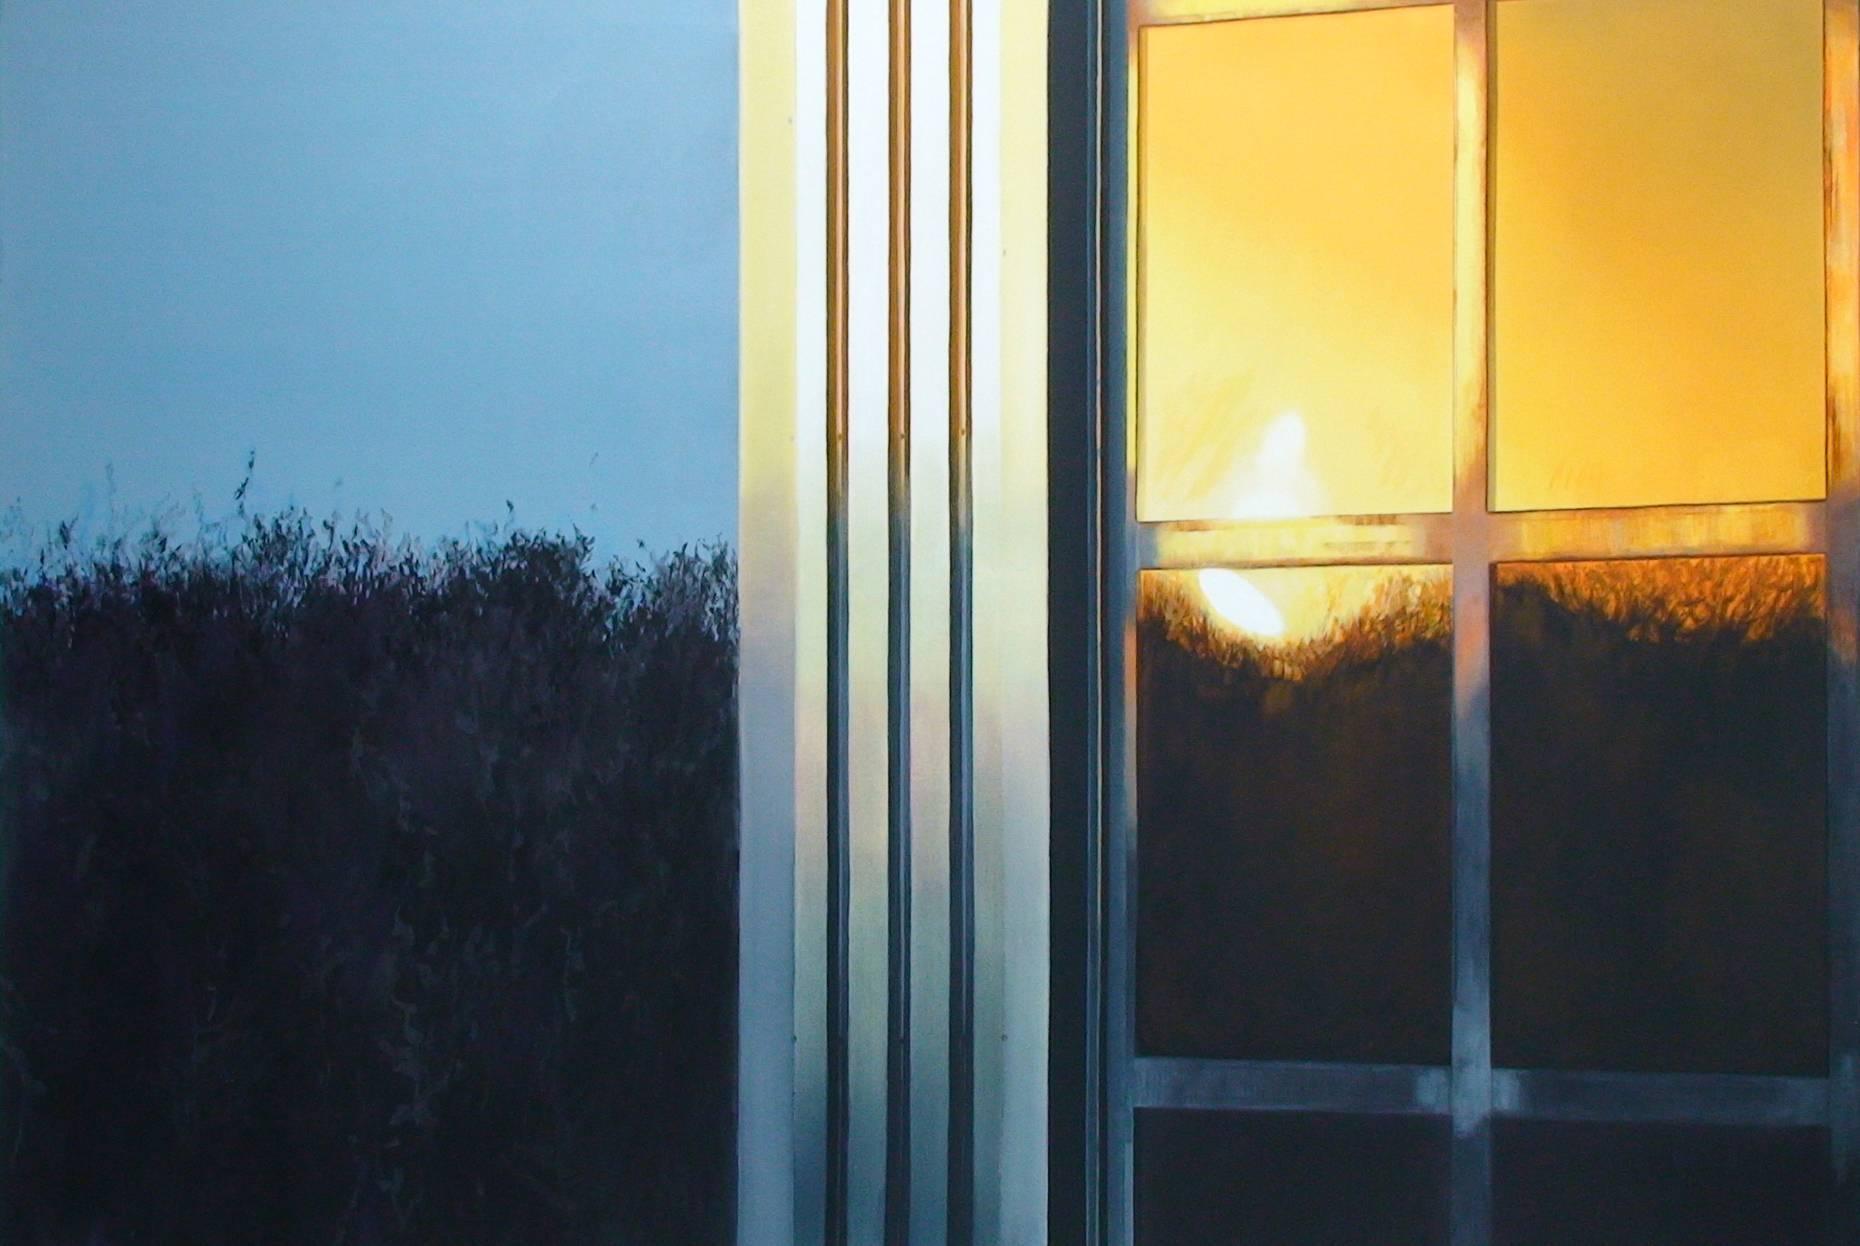 Fensterbild 2003 Acrylfarbe a/Nessel 160 x 240 cm